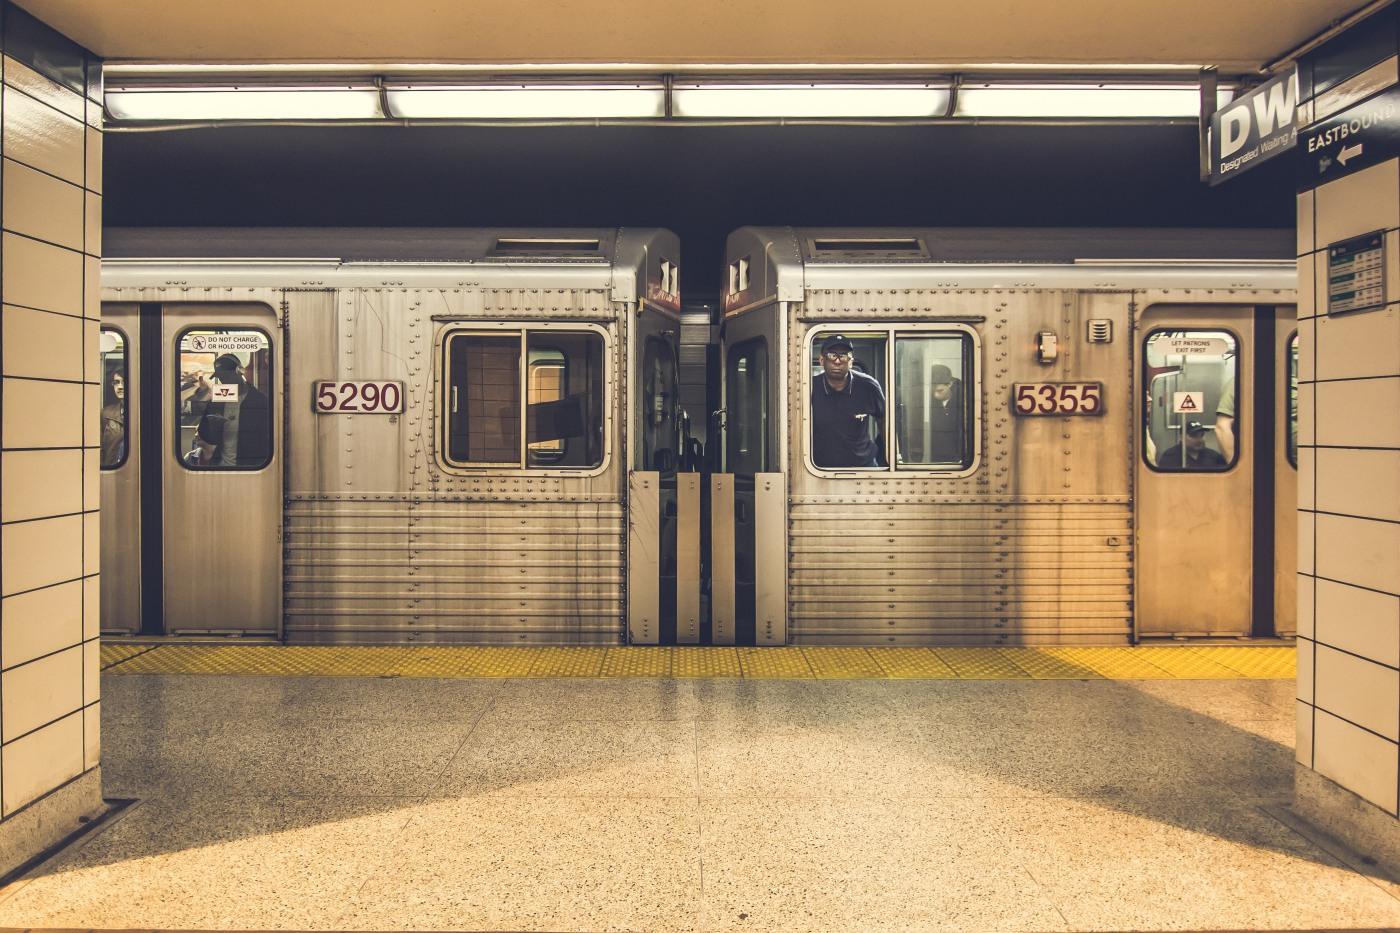 Image Description: An image of a hallway TTC hallway that looks onto a platform where an old TTC subway train waits